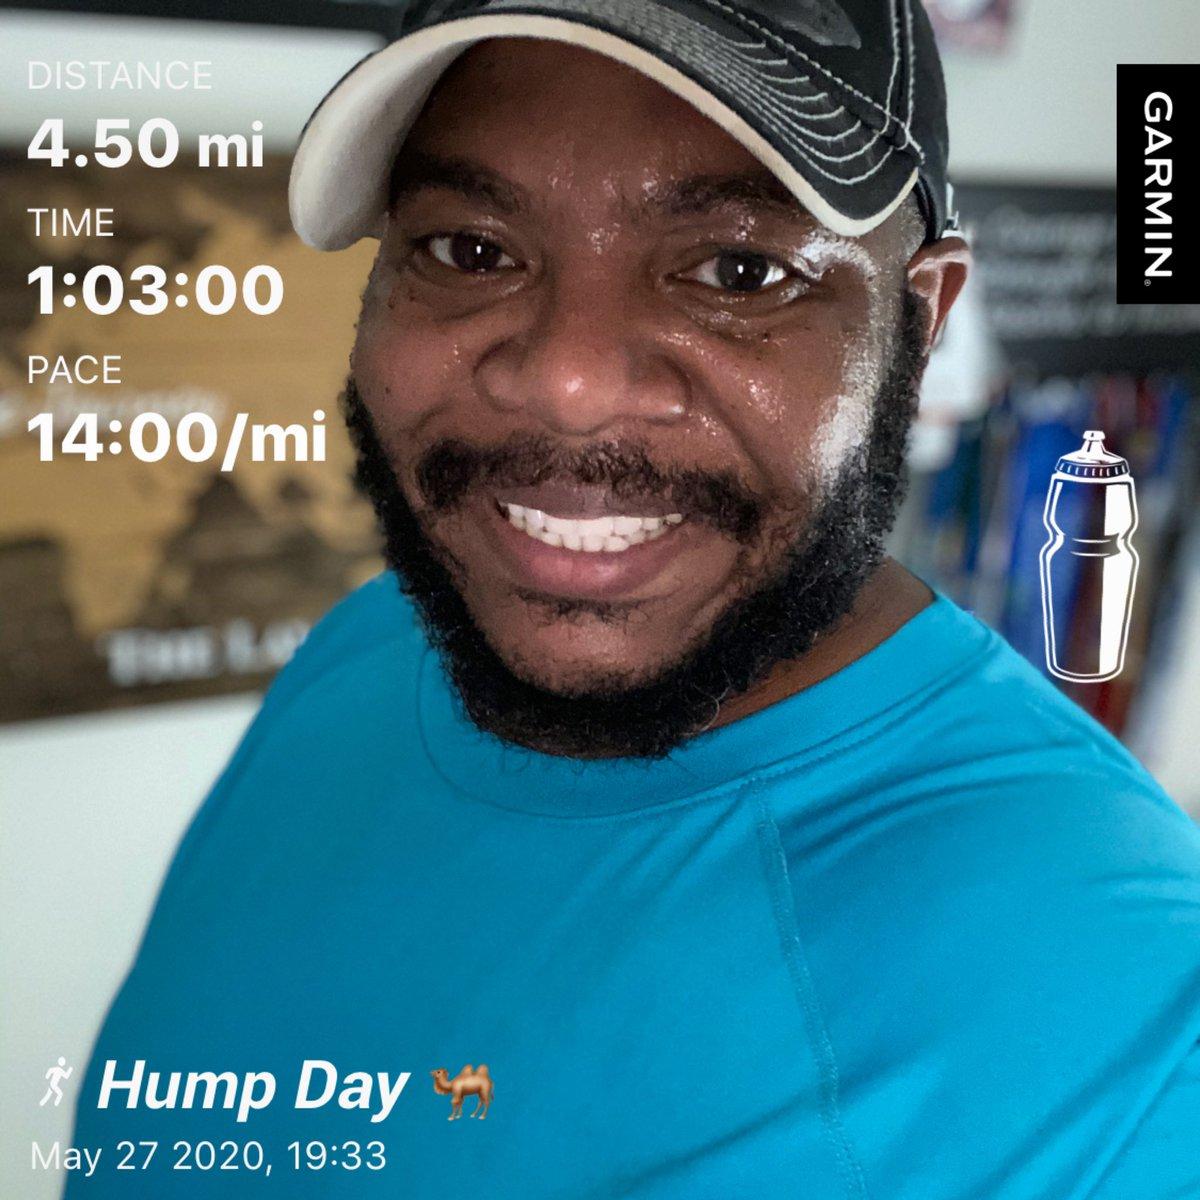 Humpday  #dreadmill #StayHome  #StayAtHome  #staysafe  #naflagvisor #slowaf #runchat #bibchat #bighomieonthemove #beatyesterday #garmin<br>http://pic.twitter.com/VACaRgoyXG